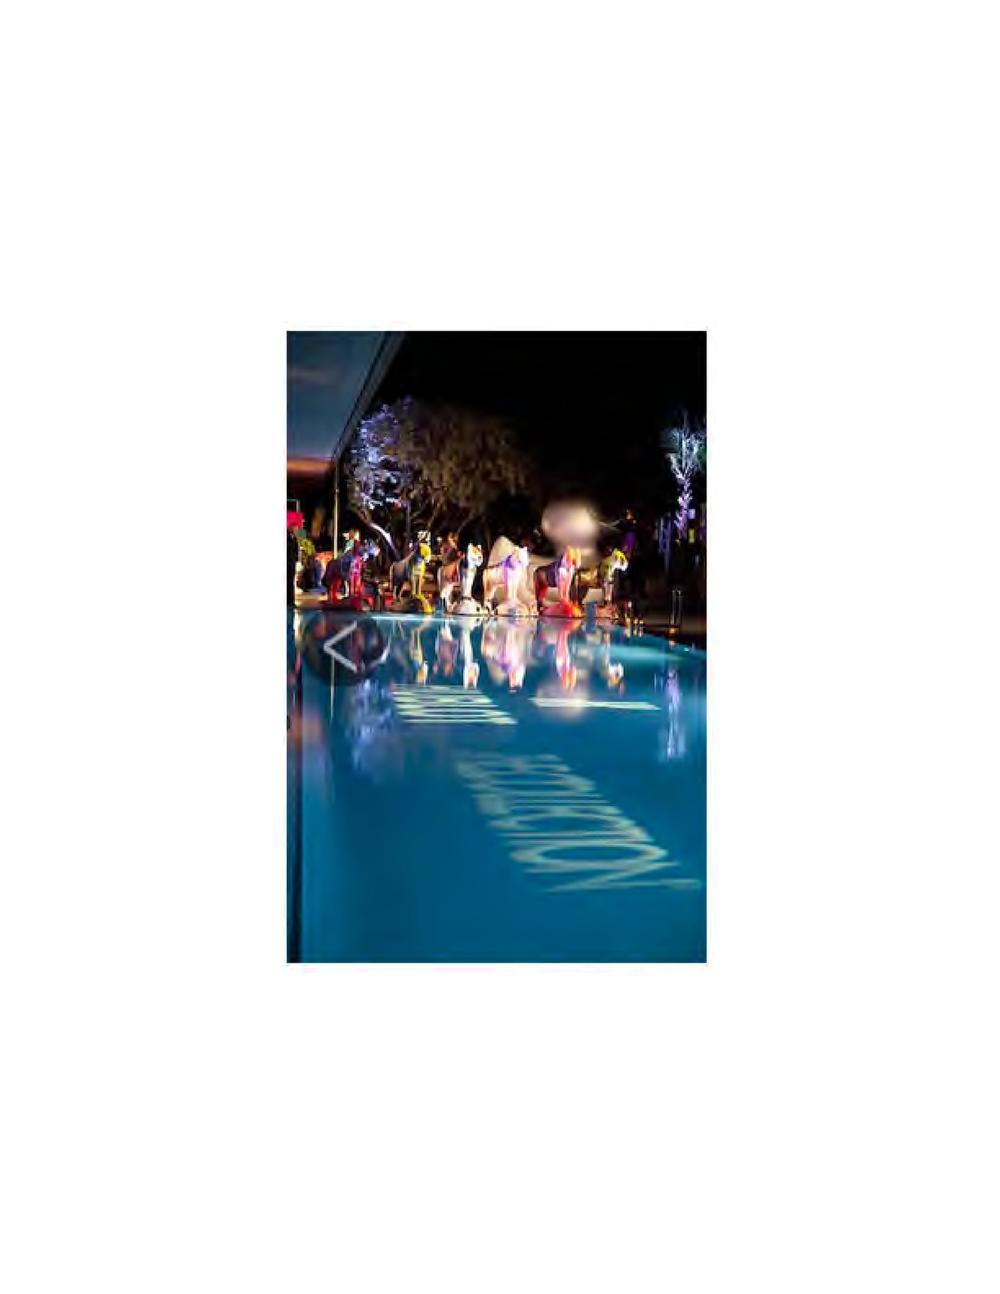 Miami_Art_Basel_Photographs-web-page-107.jpg